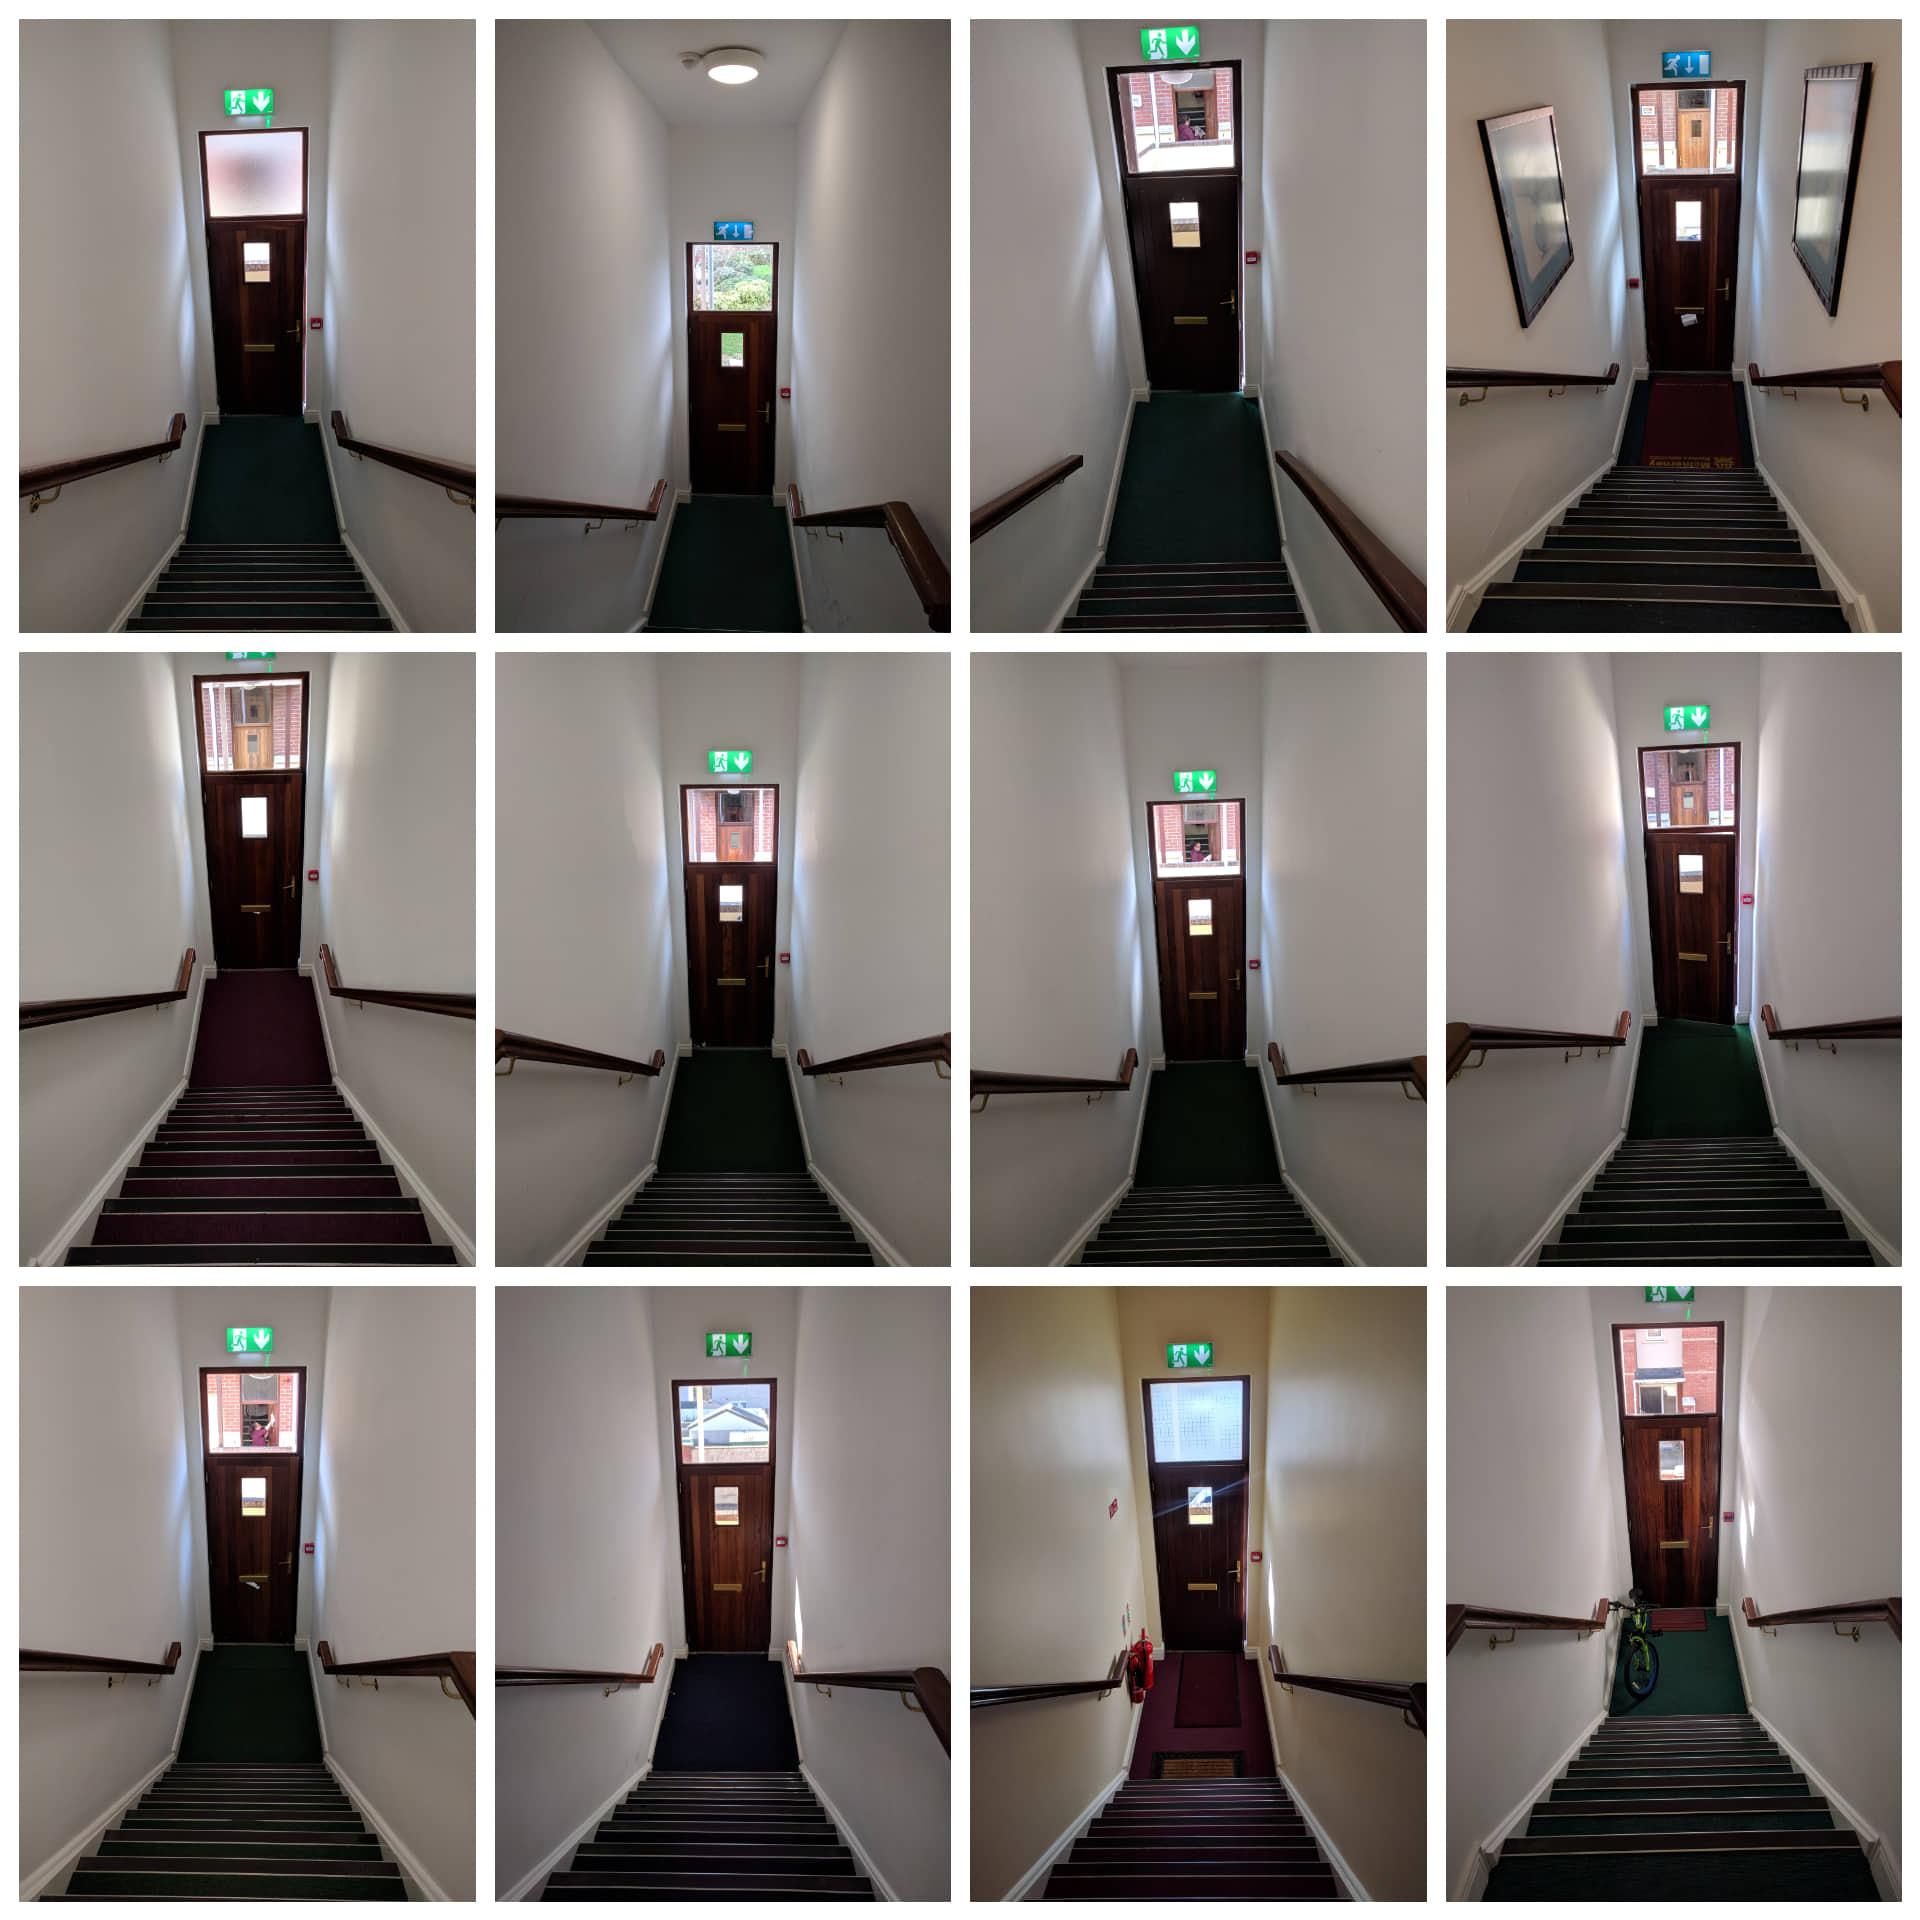 Apartment Hallway Cleaning Dublin